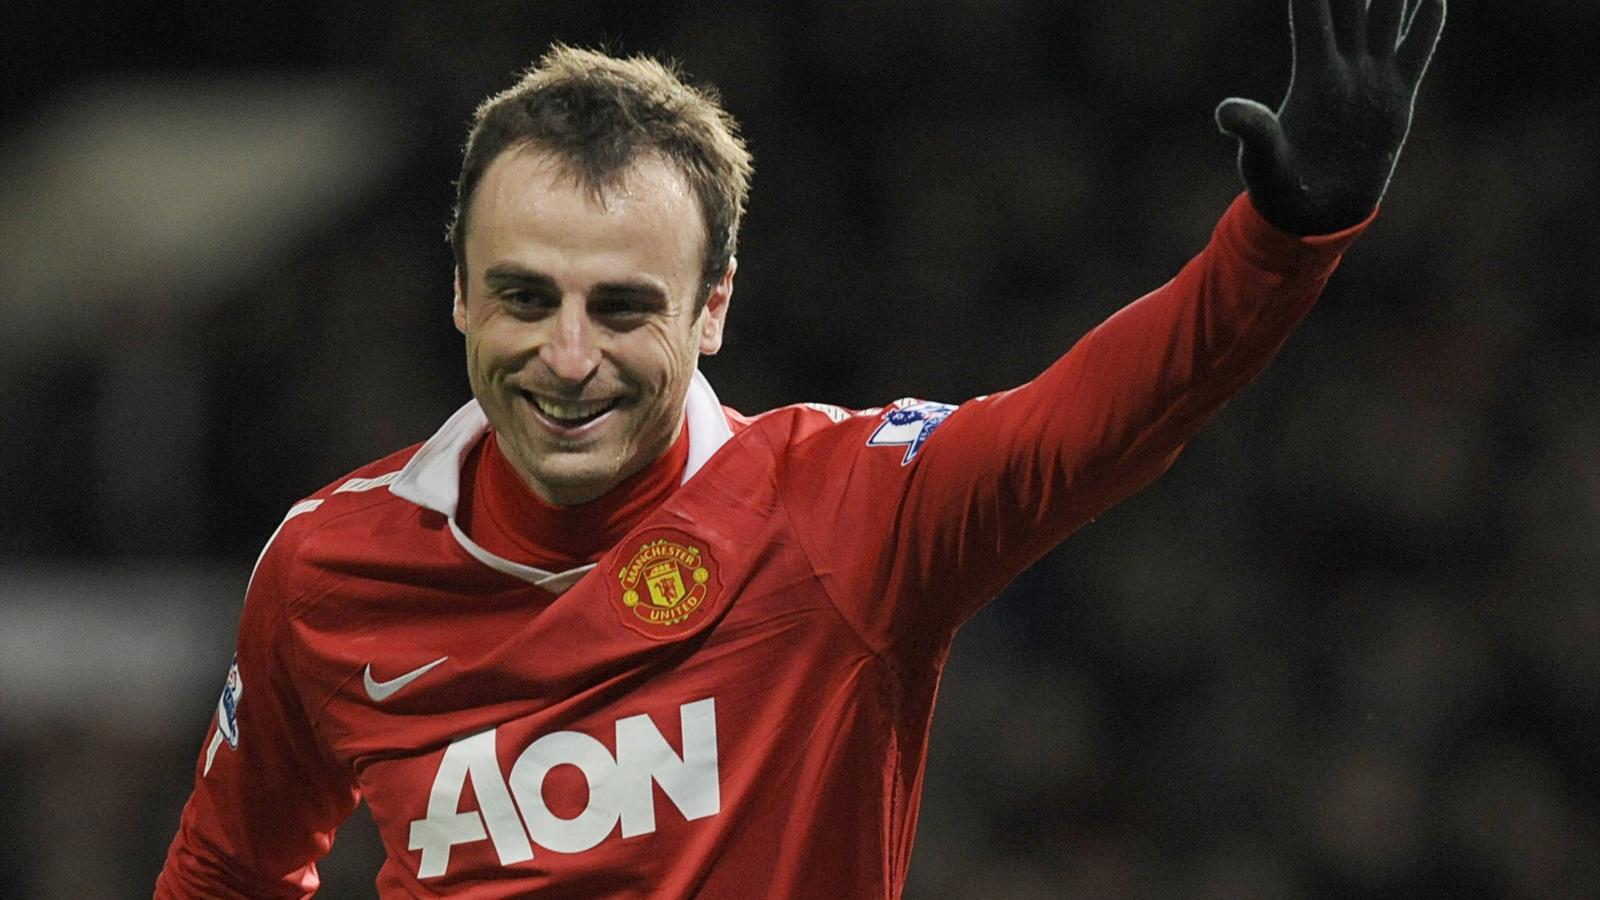 Dimitar Berbatov in his days with Manchester United